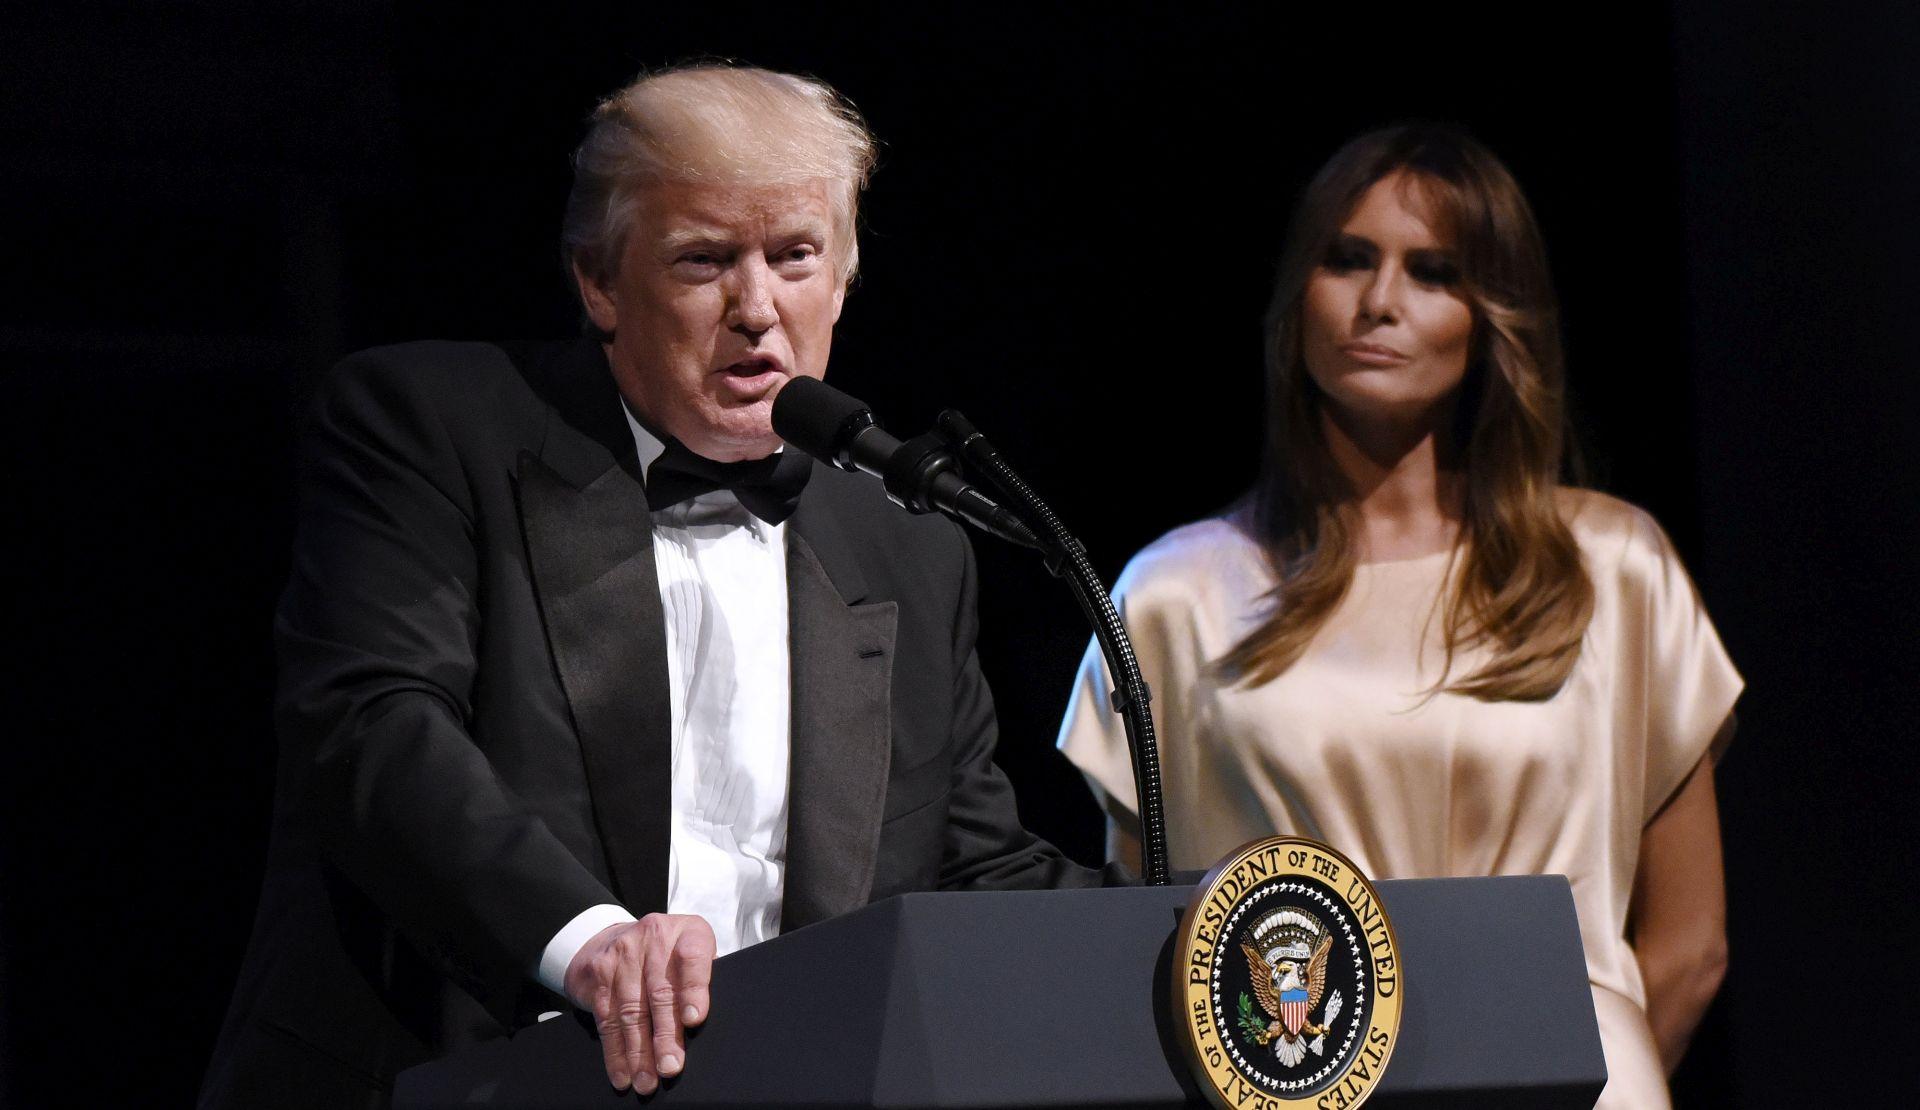 Trump pohvalio veterane, kritizirao novinare na skupu u Centru Kennedy